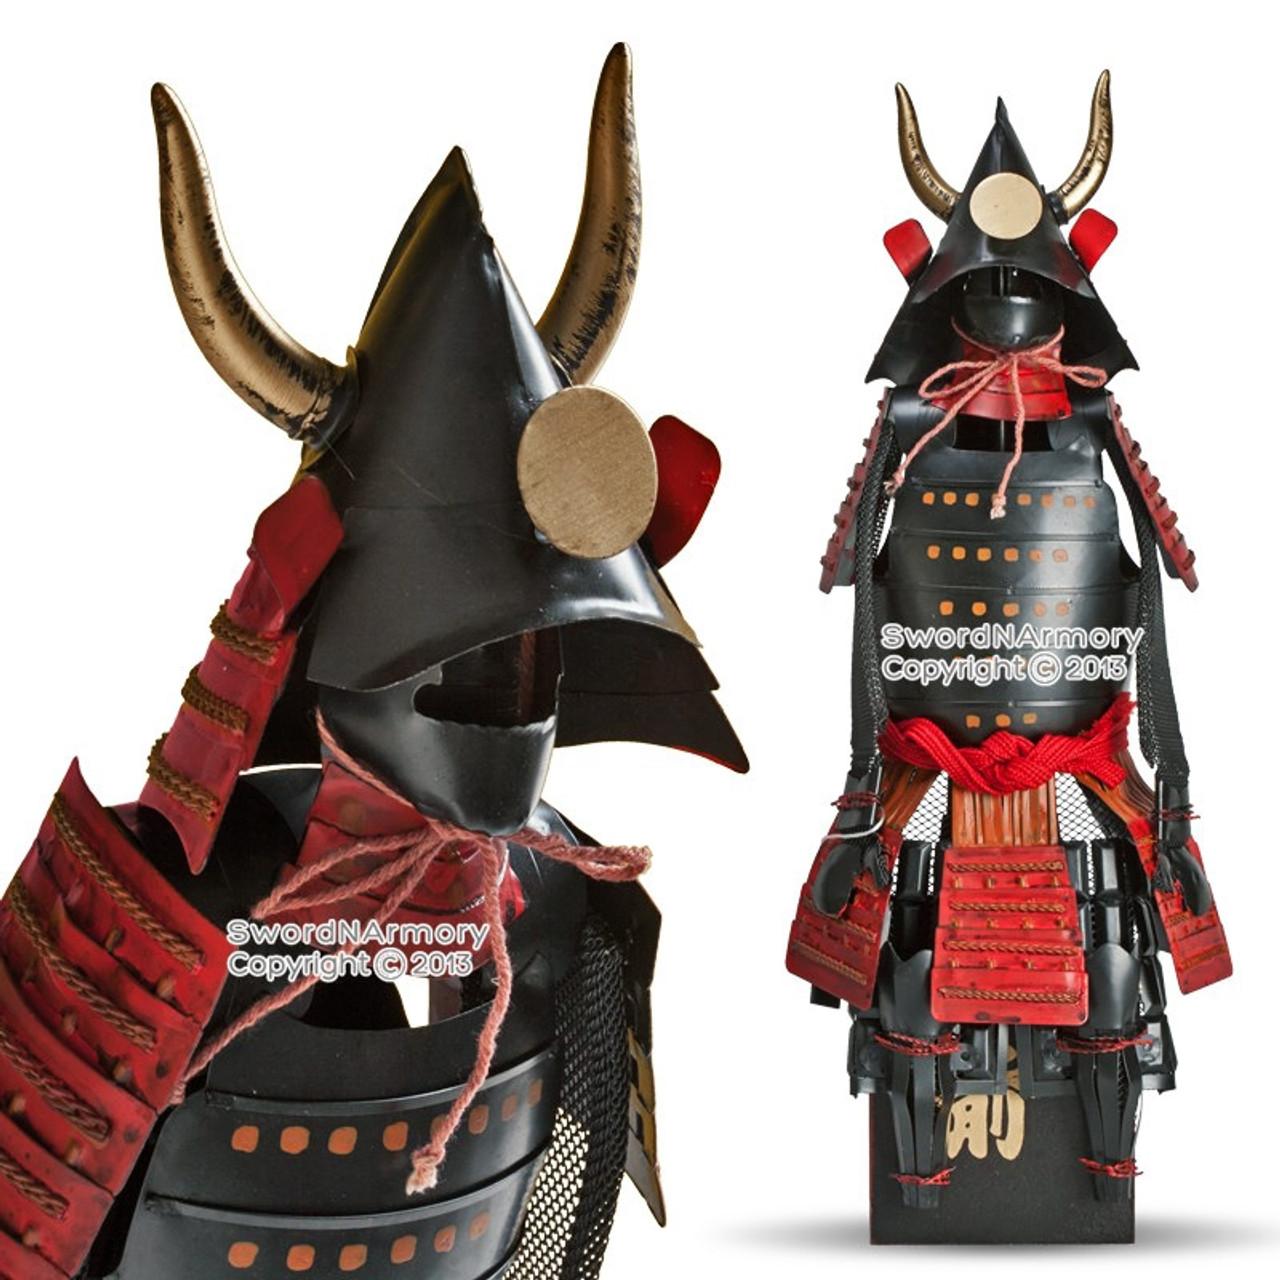 15 5 Quot High Kuroda Clan Shogun Japanese Samurai Armor